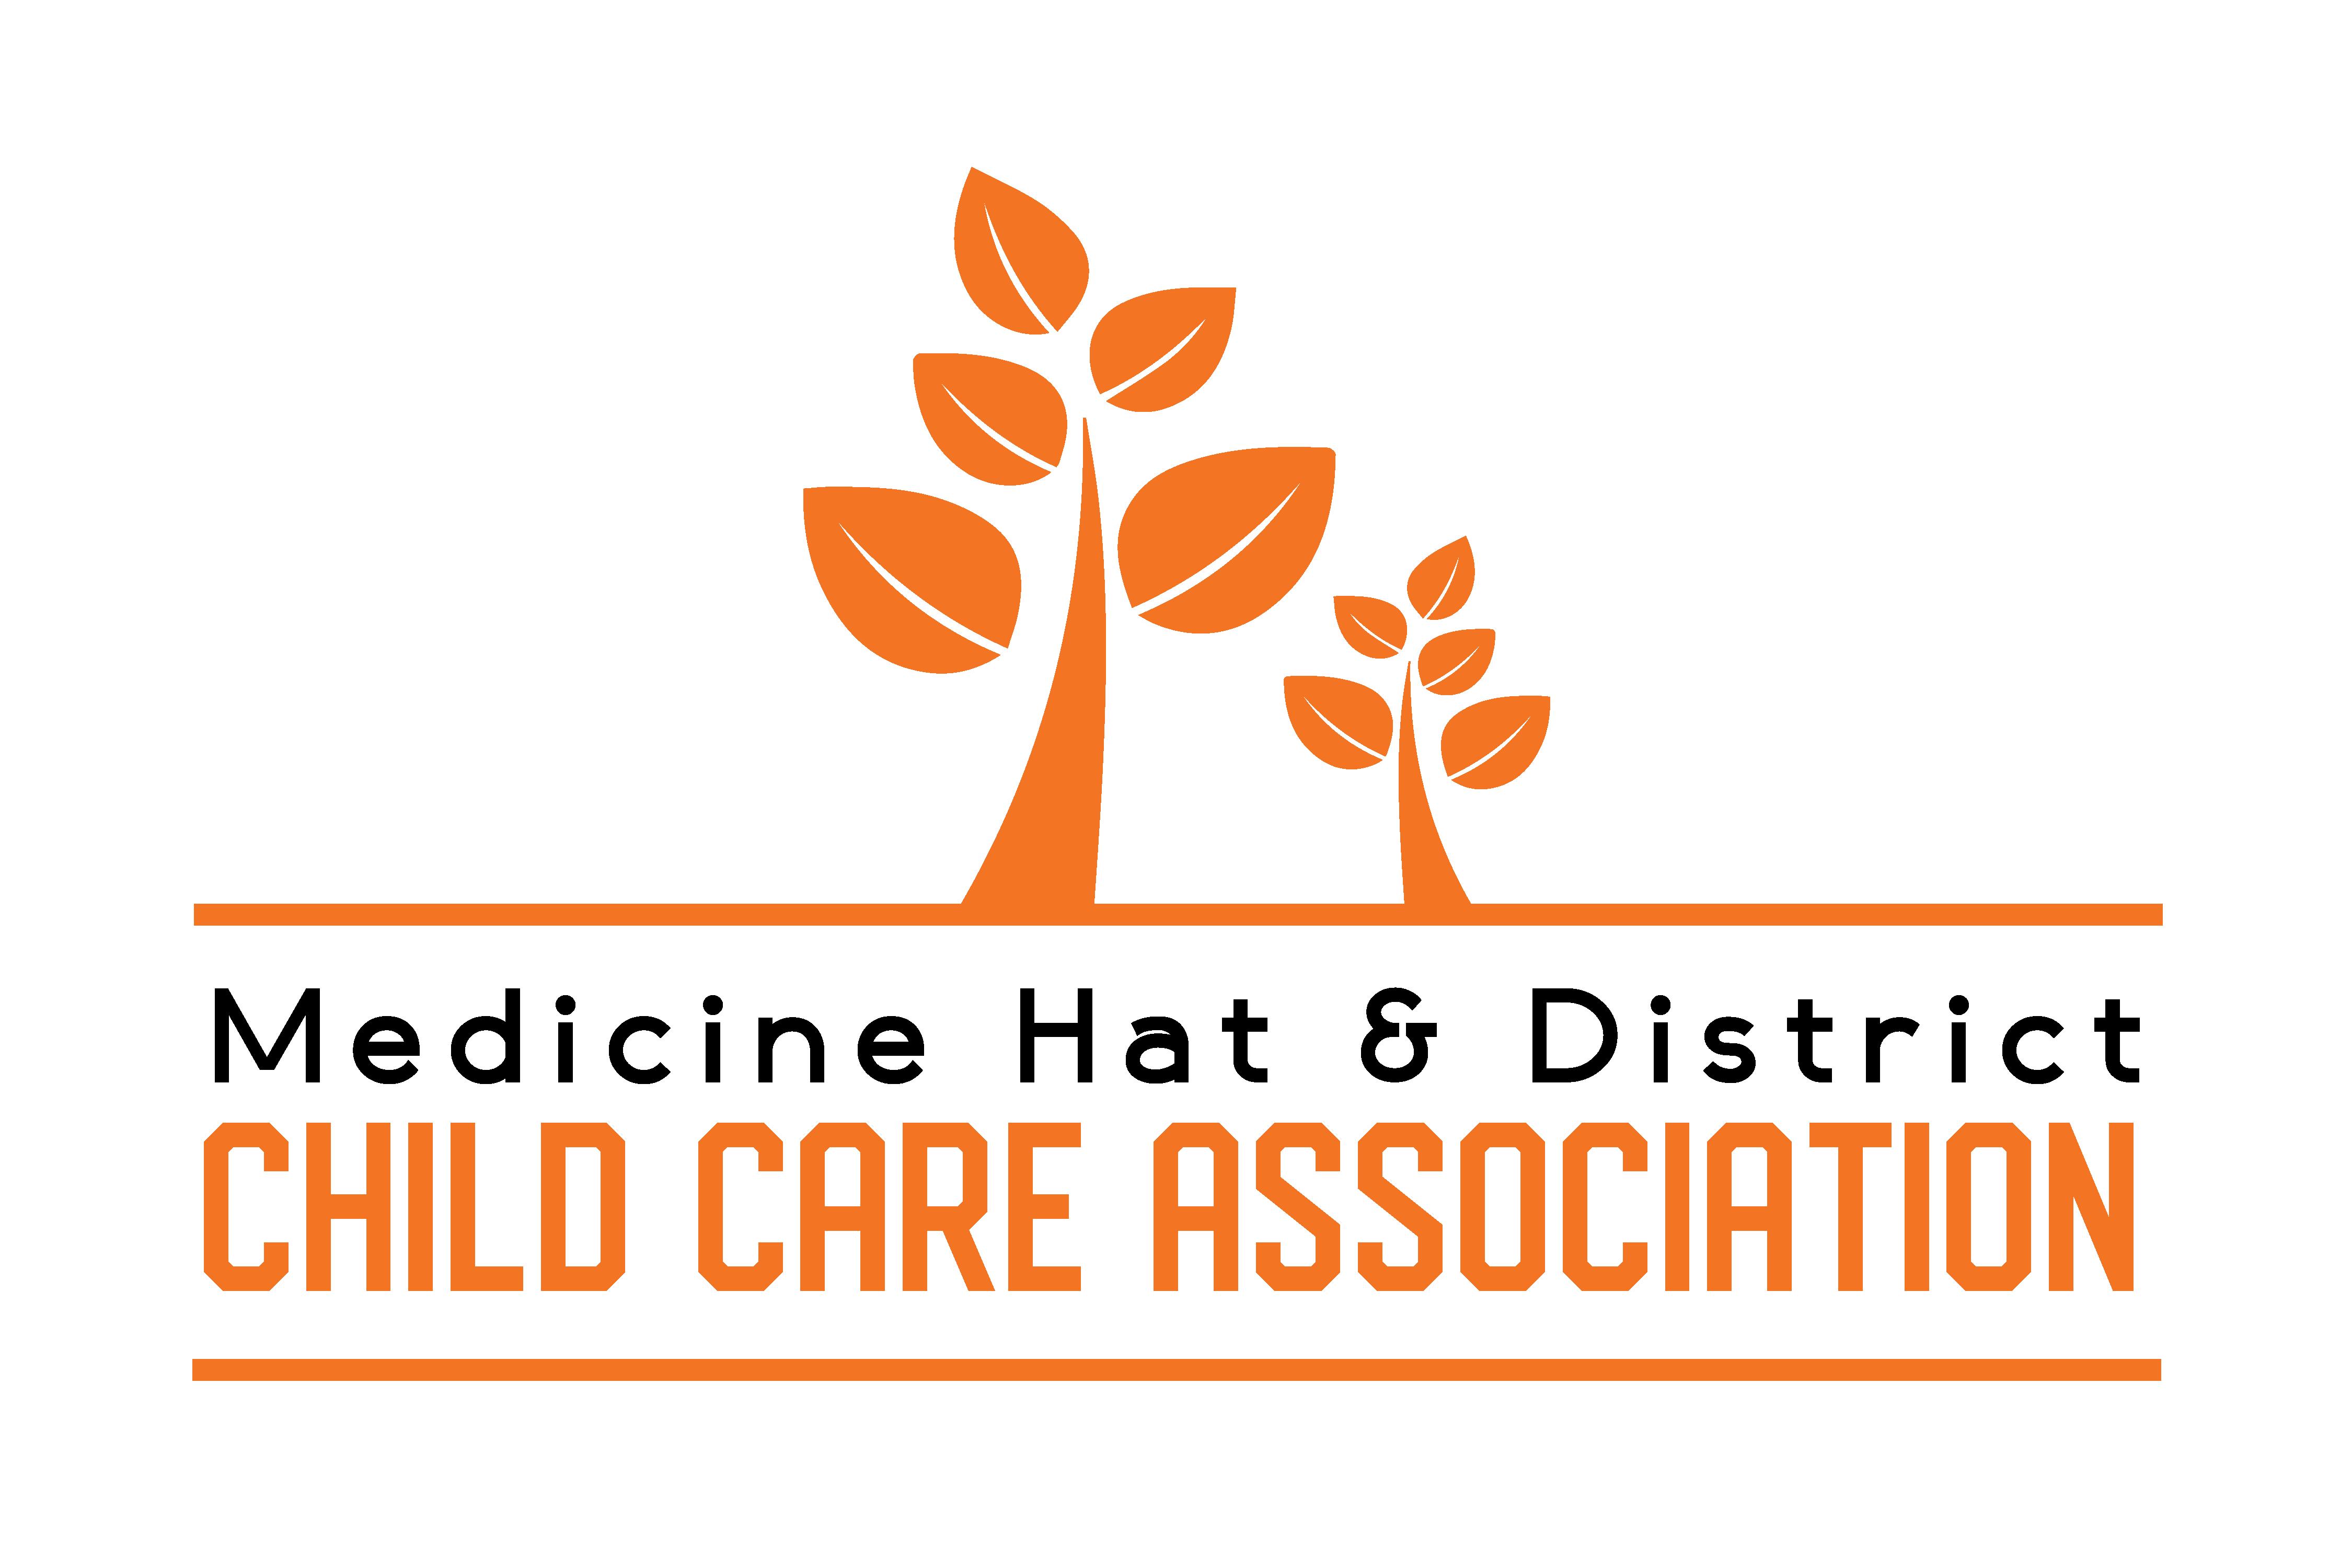 Medicine Hat & District Child Care Association